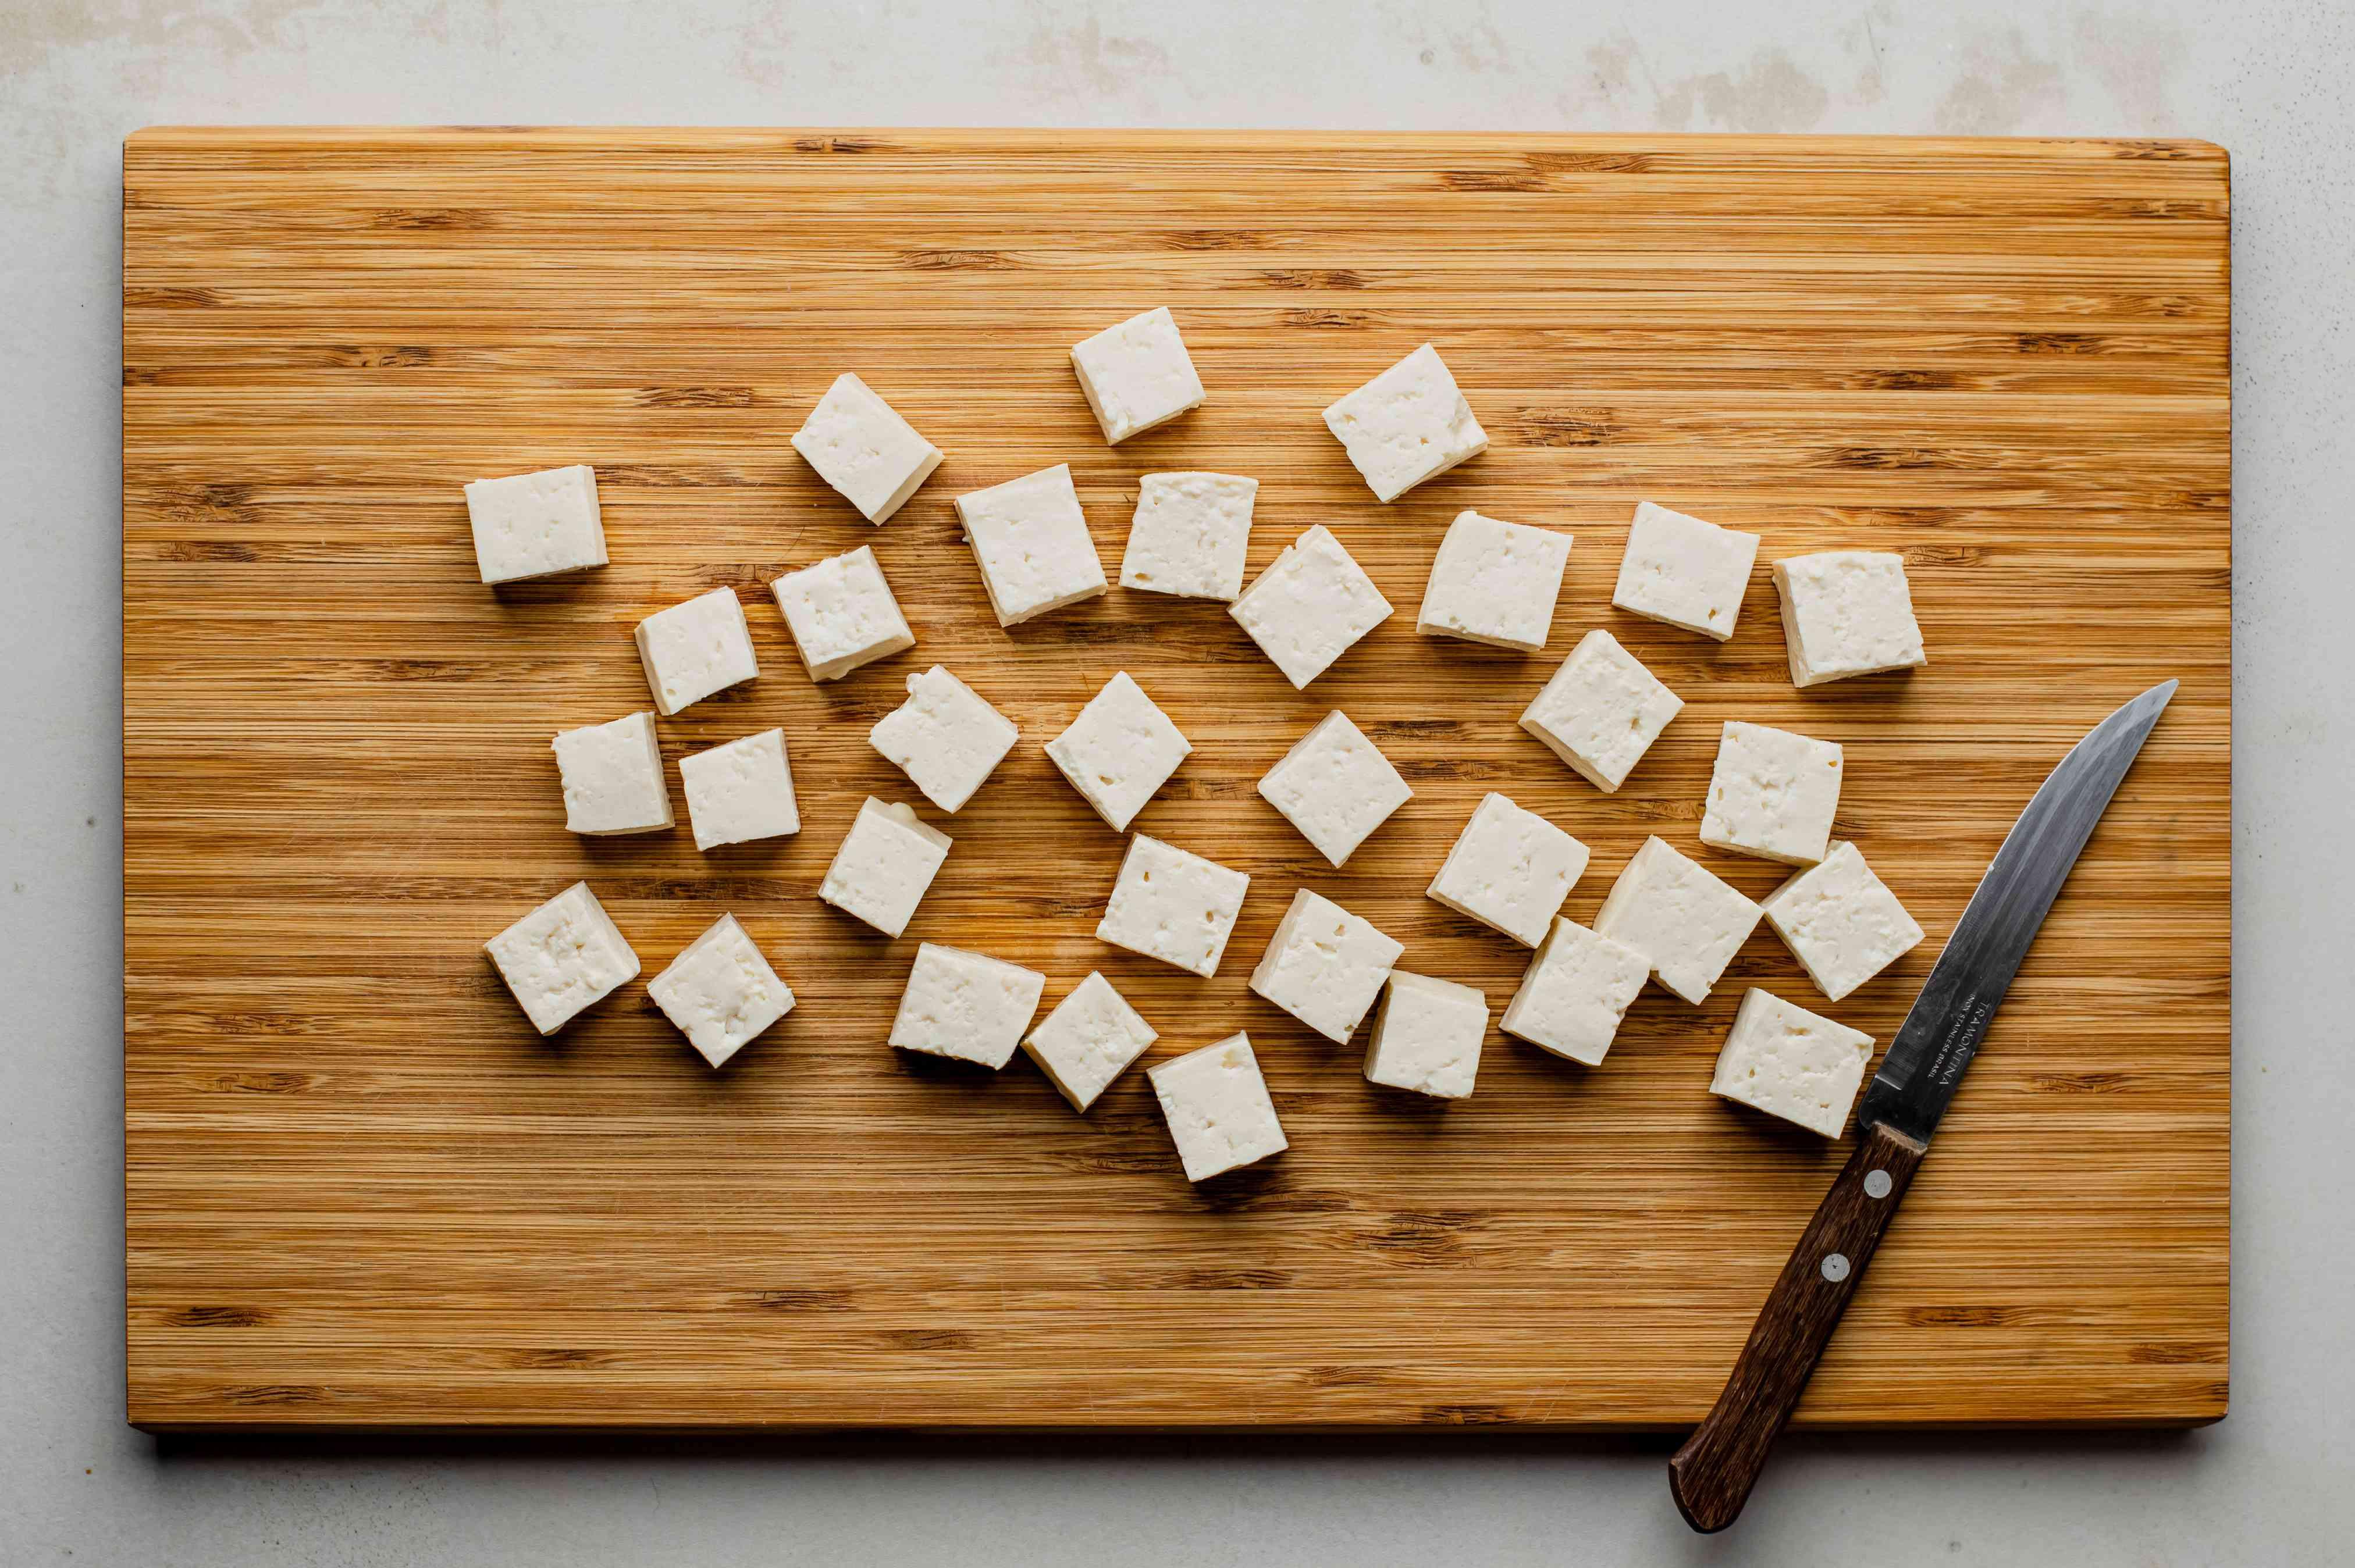 Drain tofu